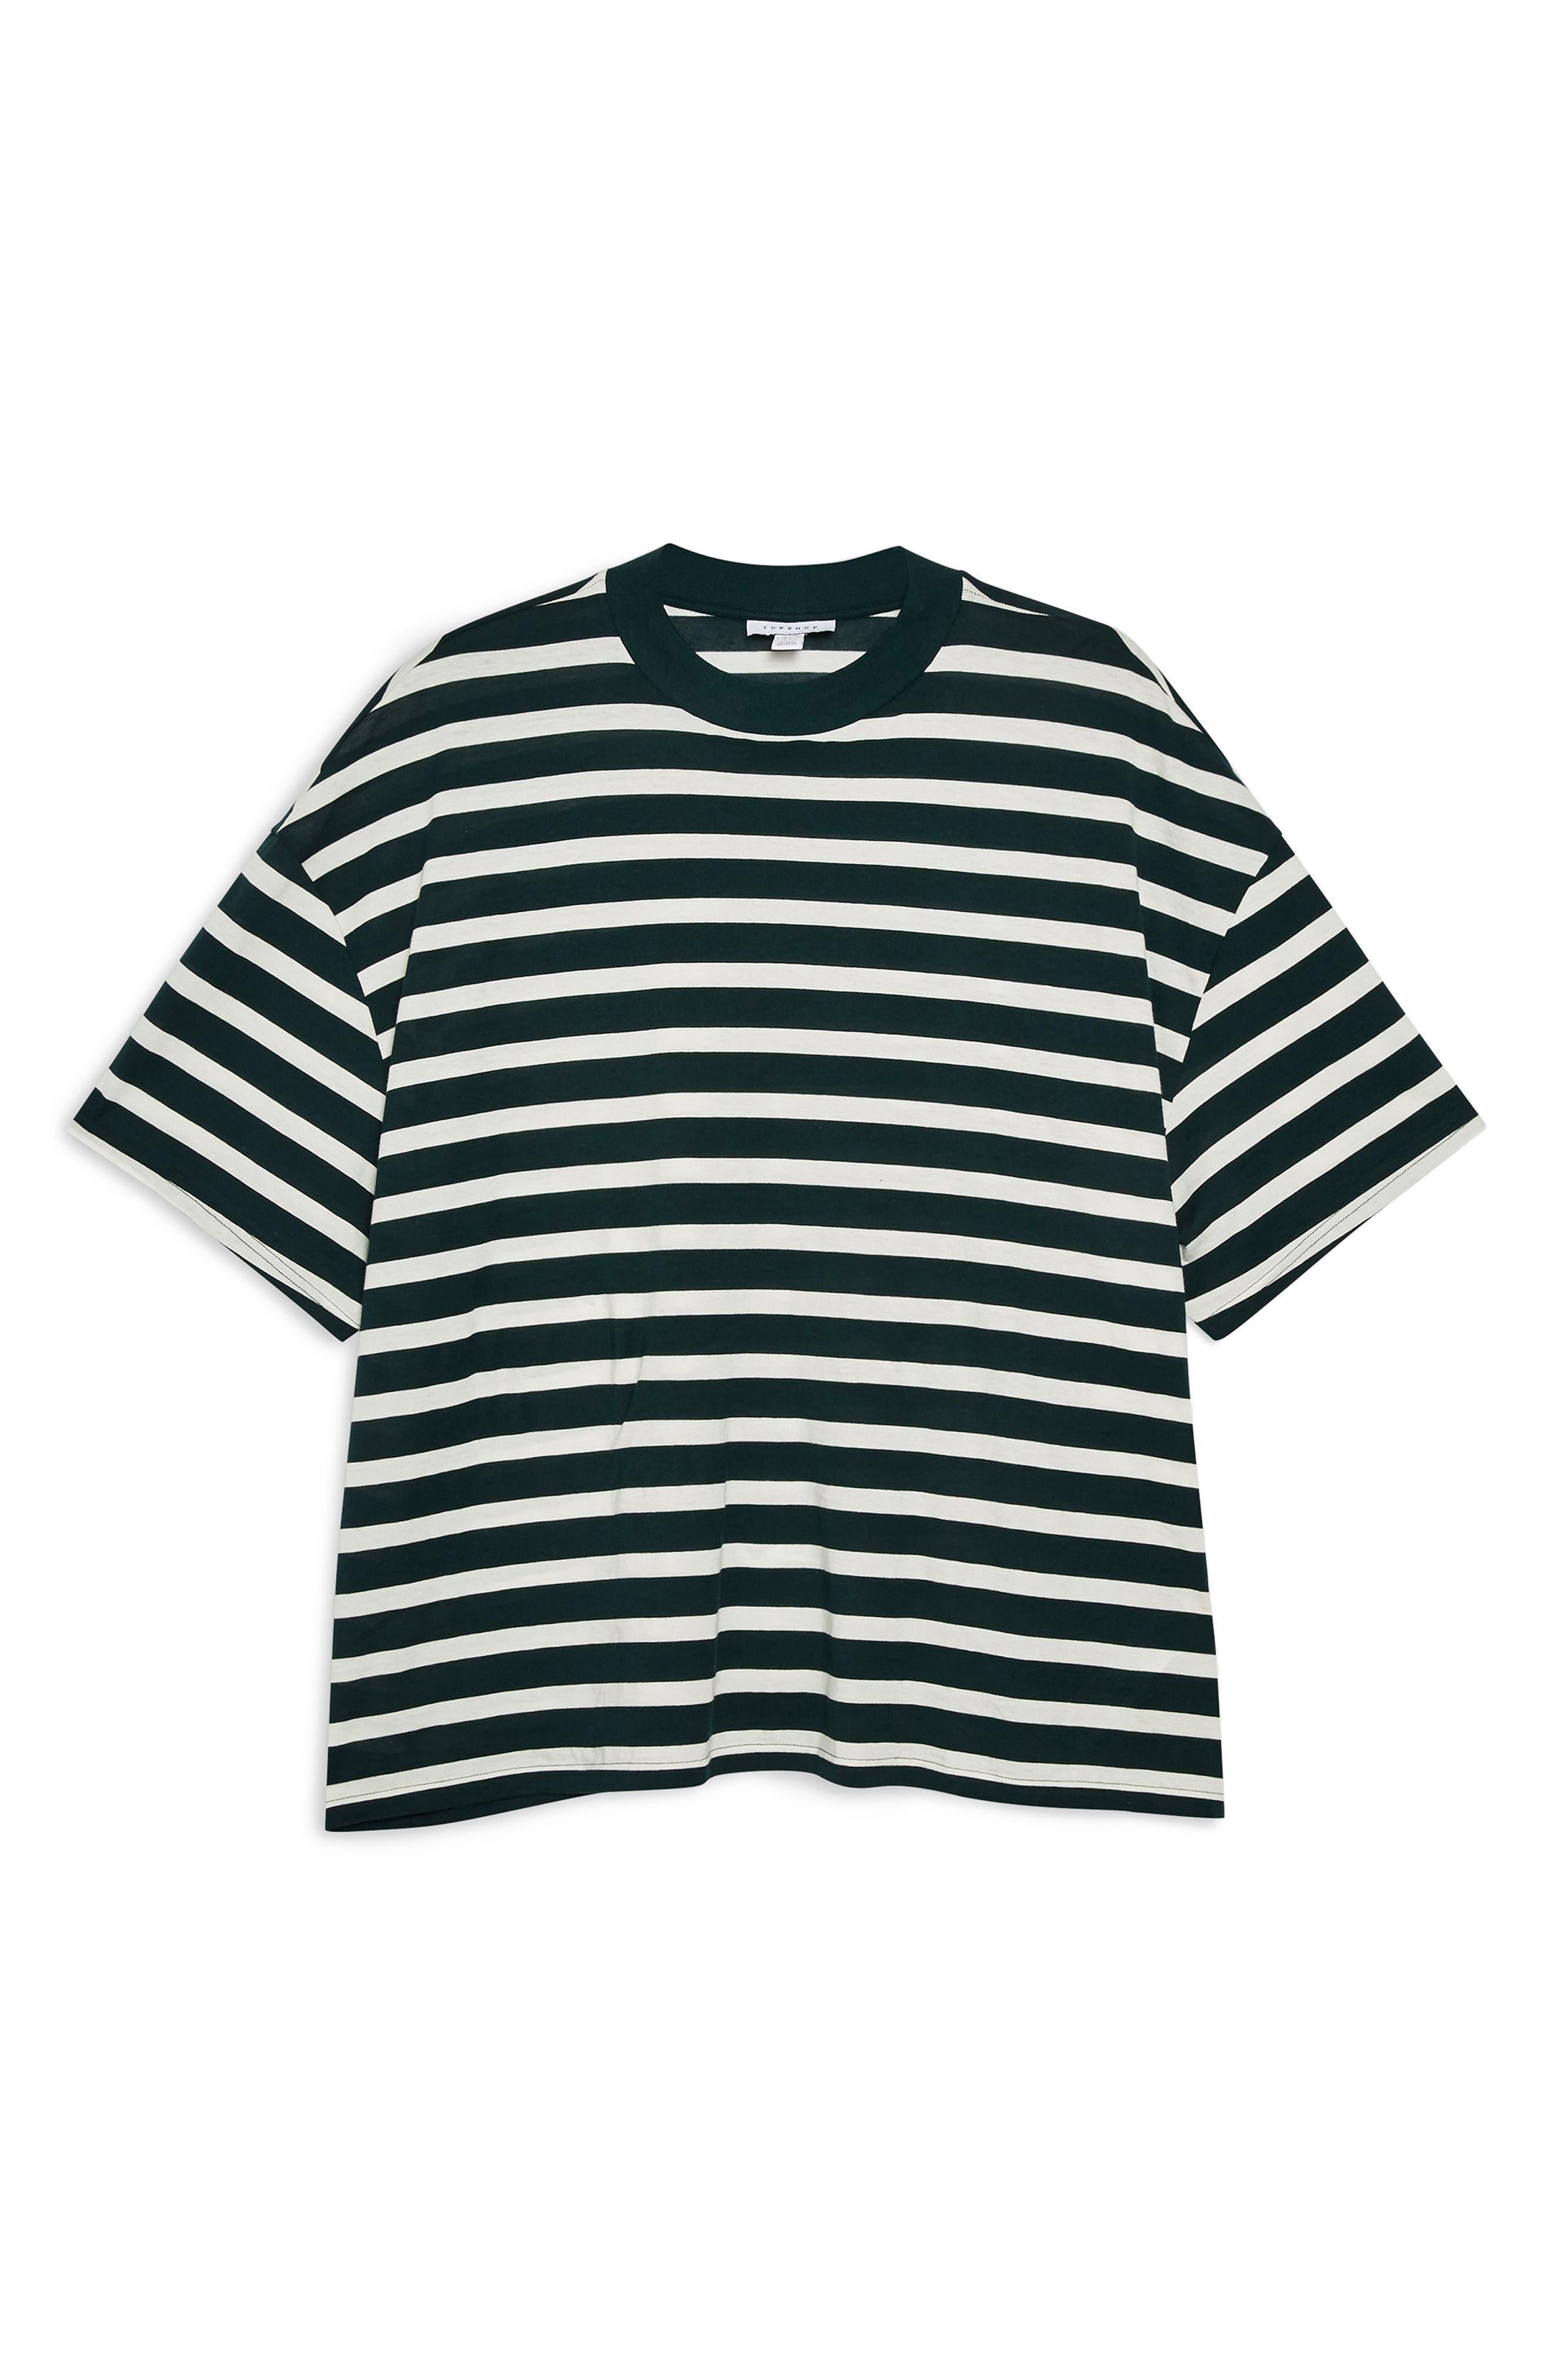 TOPSHOP, Stripe Tee, Alternate thumbnail 3, color, 340